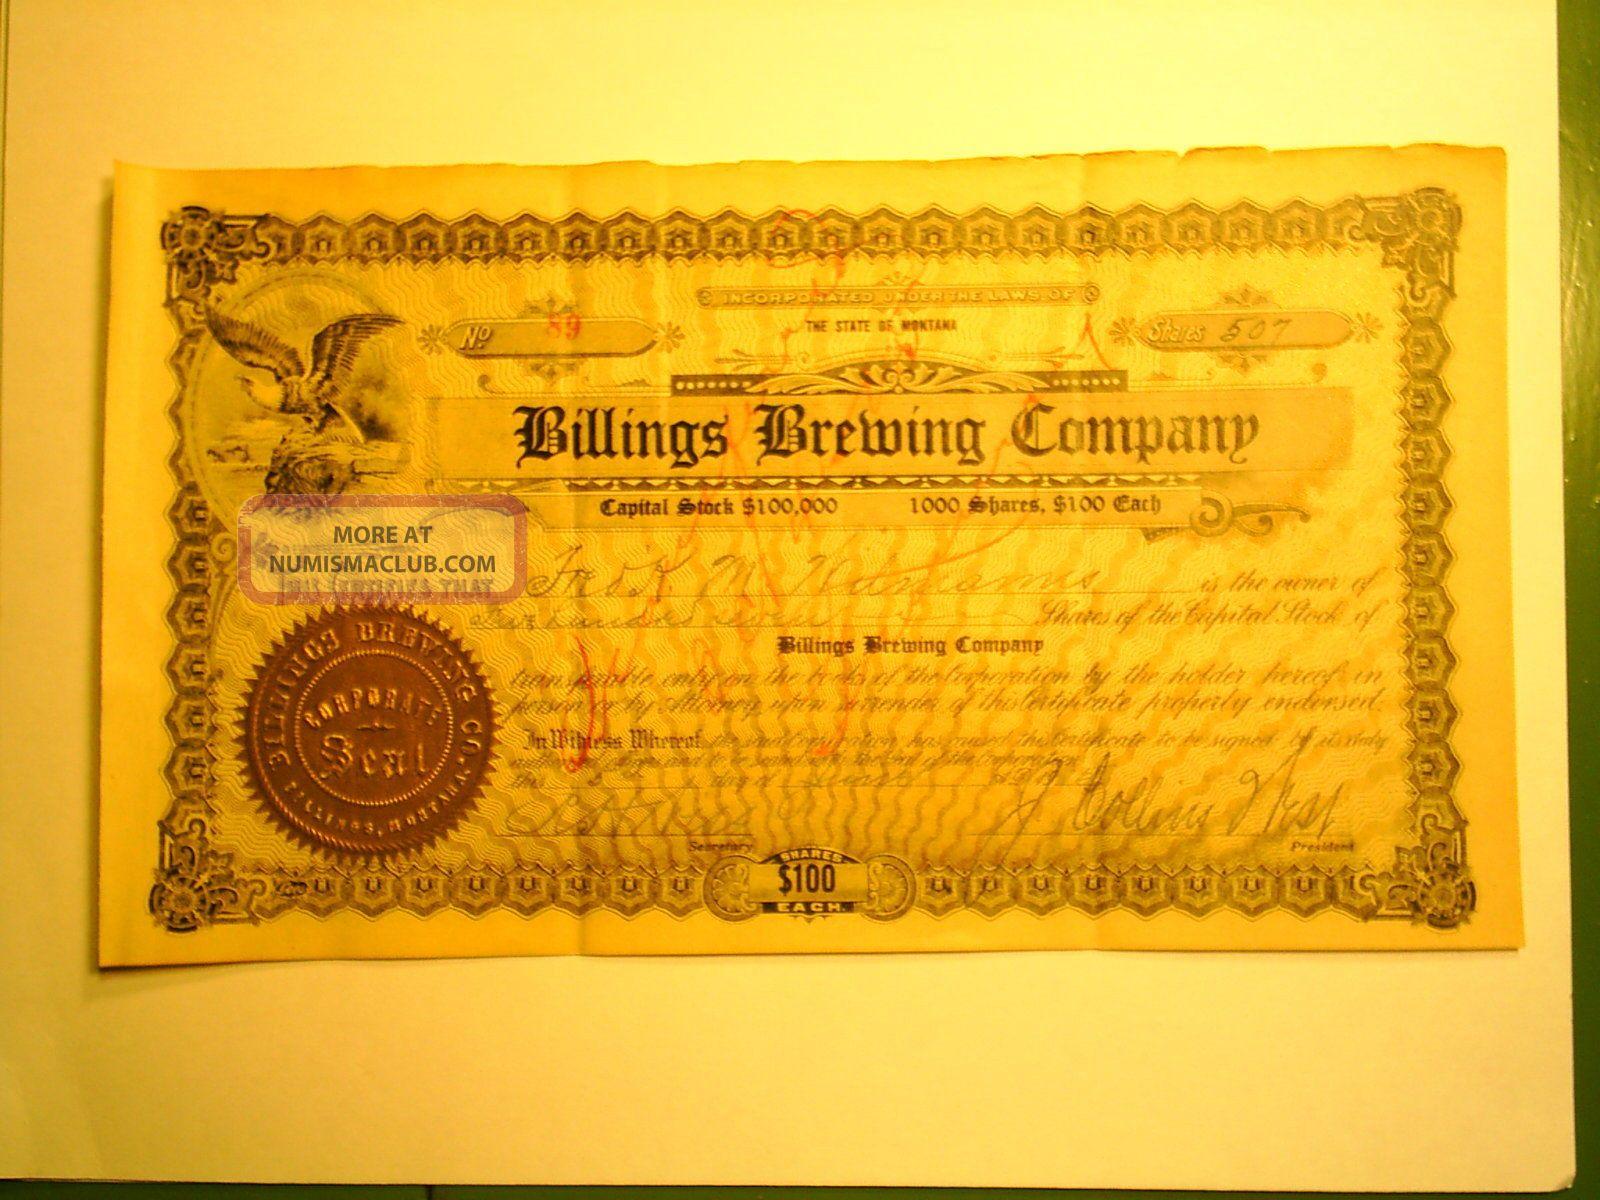 Antique 1915 Billings Brewing Stock Certificate (yellowstone,  Montana,  Beer) Stocks & Bonds, Scripophily photo